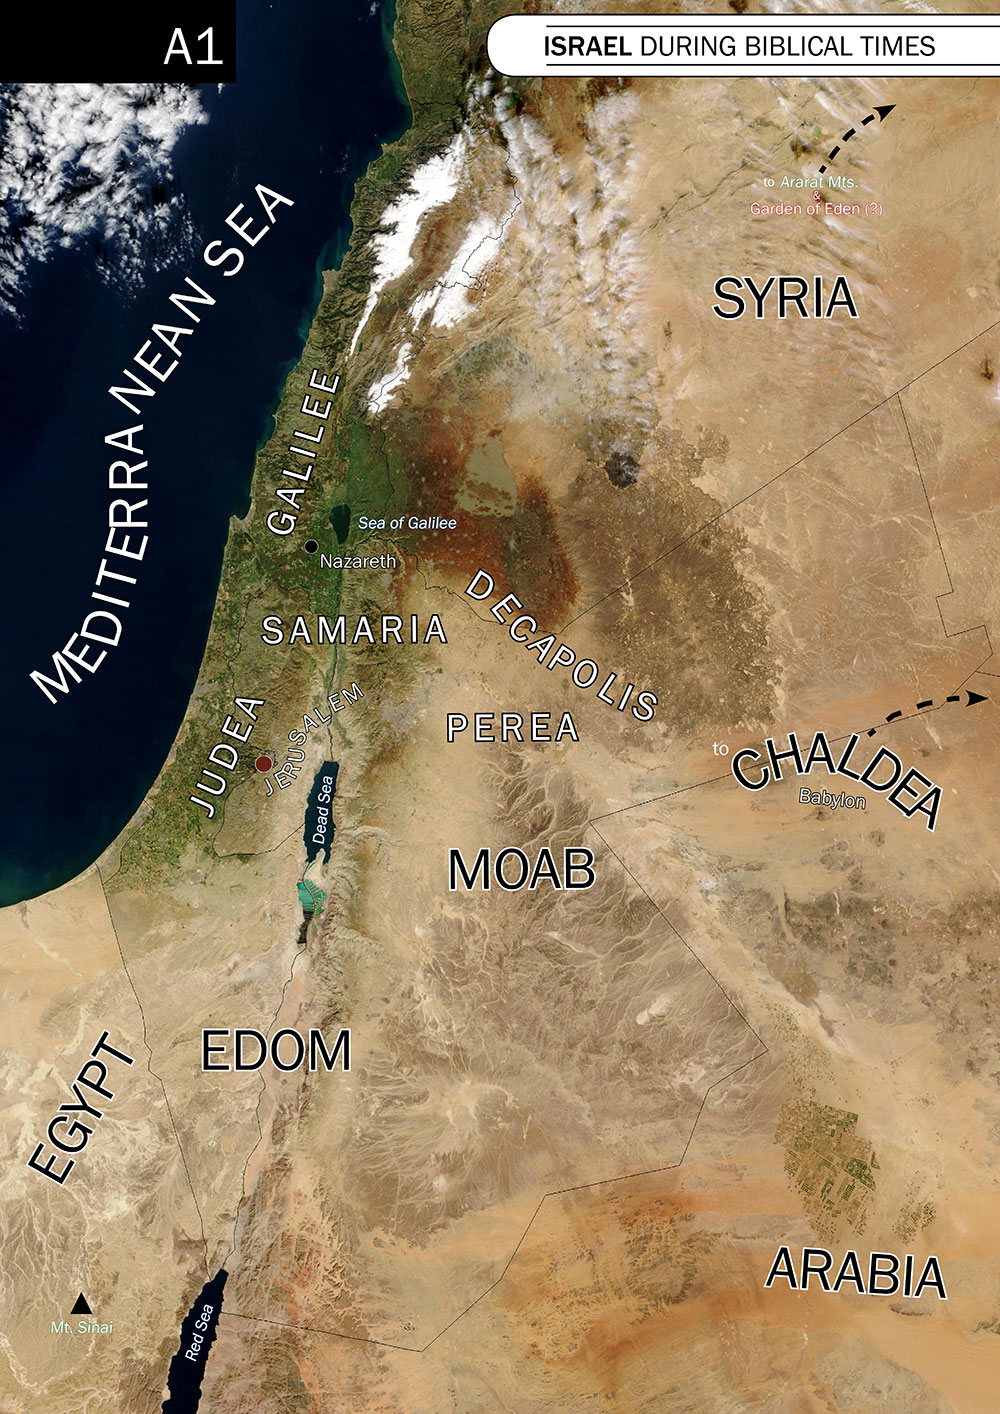 Israel during biblical times